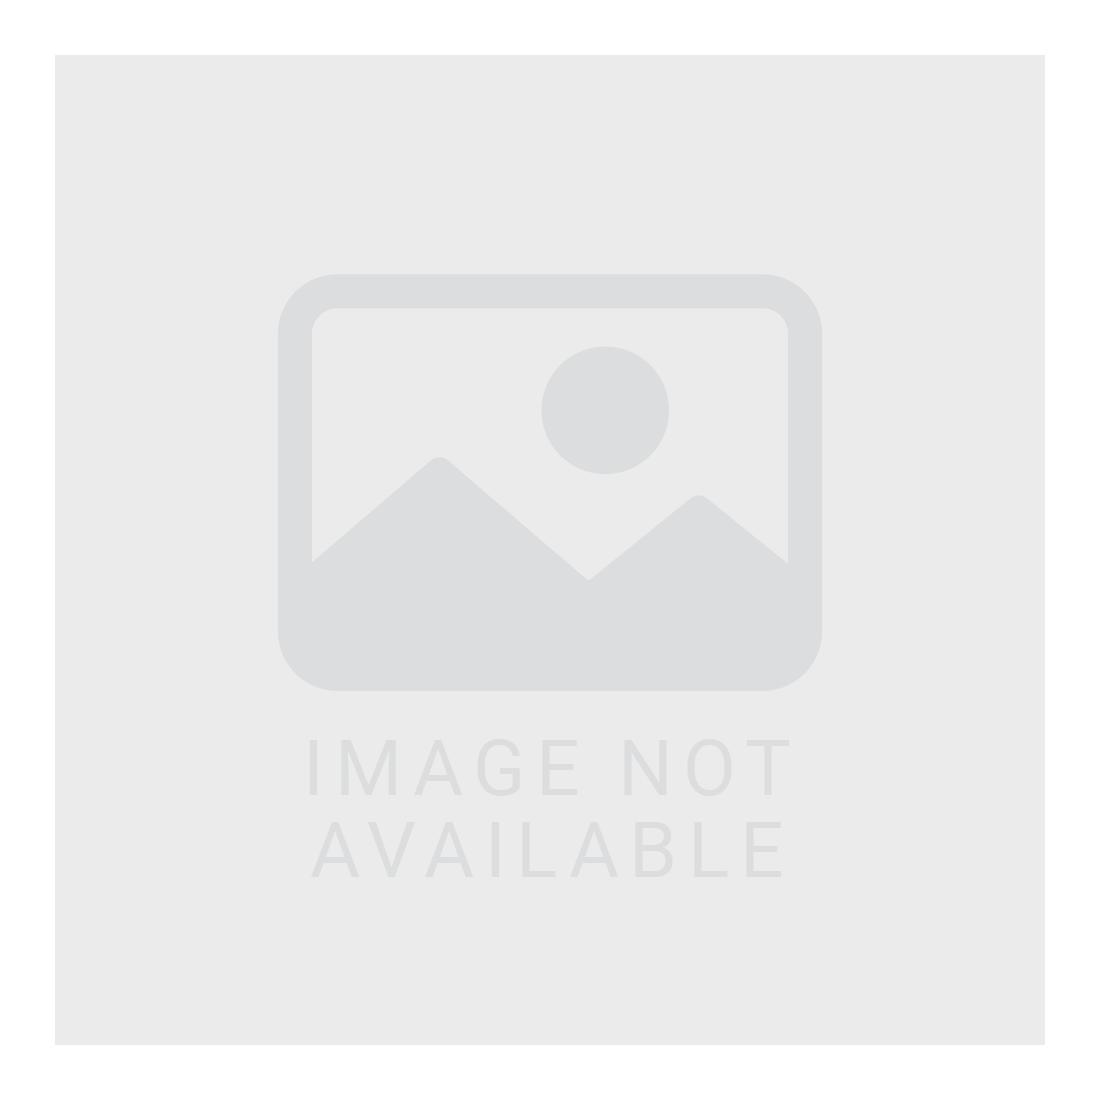 Glow In The Dark T-shirt